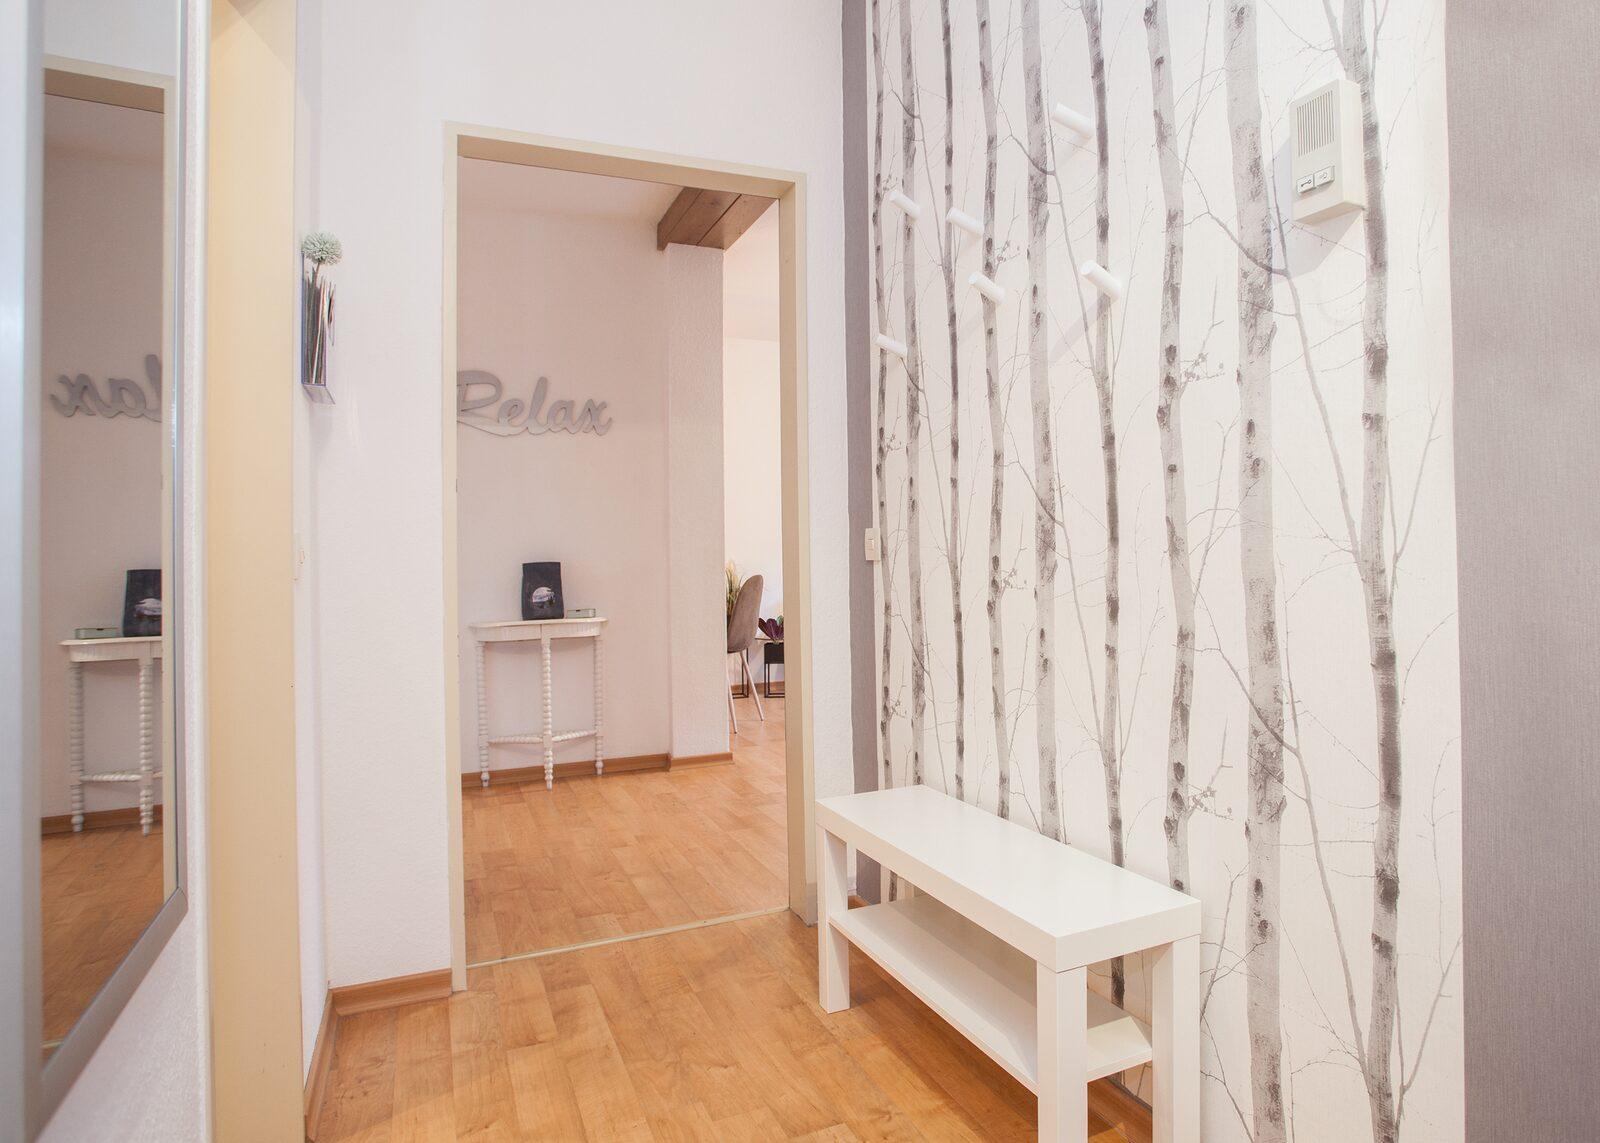 Appartement - Am Kleehagen 26-B | Winterberg-Niedersfeld